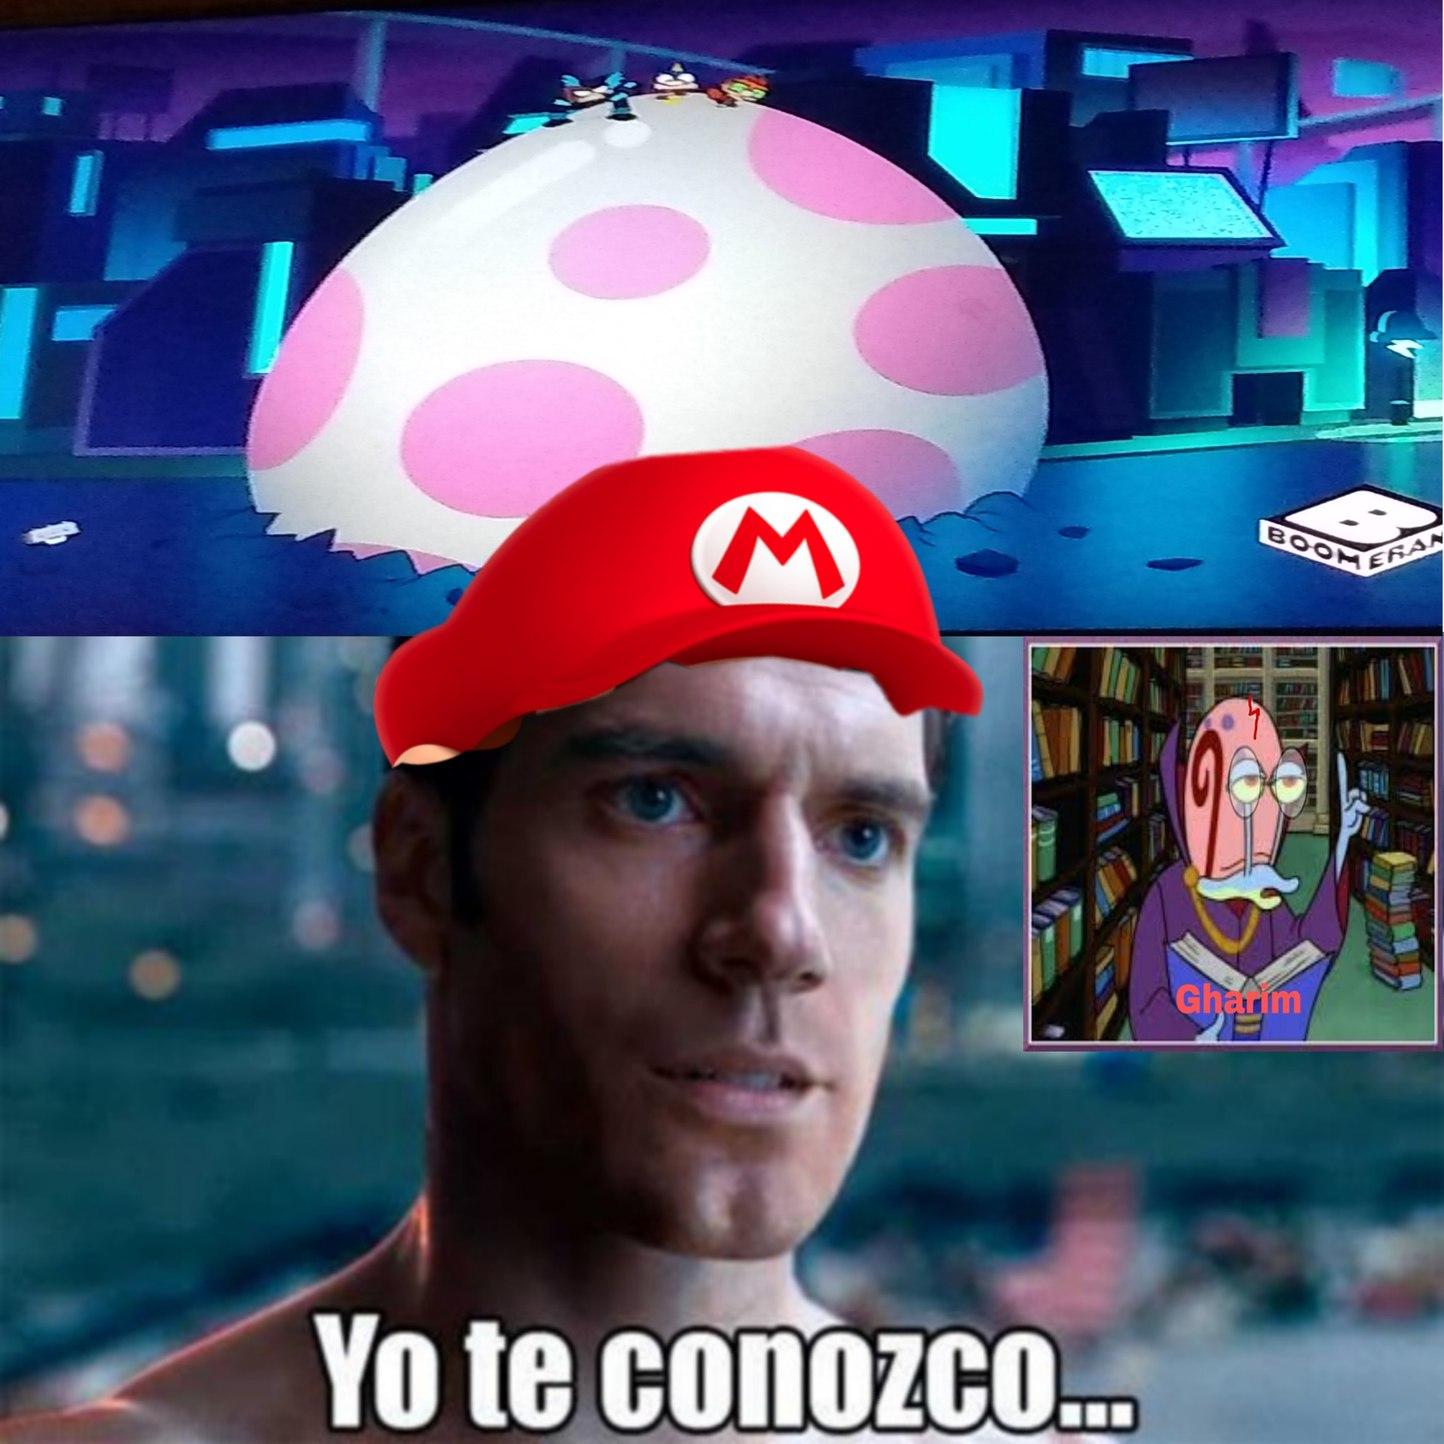 Entendí la referencia a Súper Mario, ojalá les guste - meme